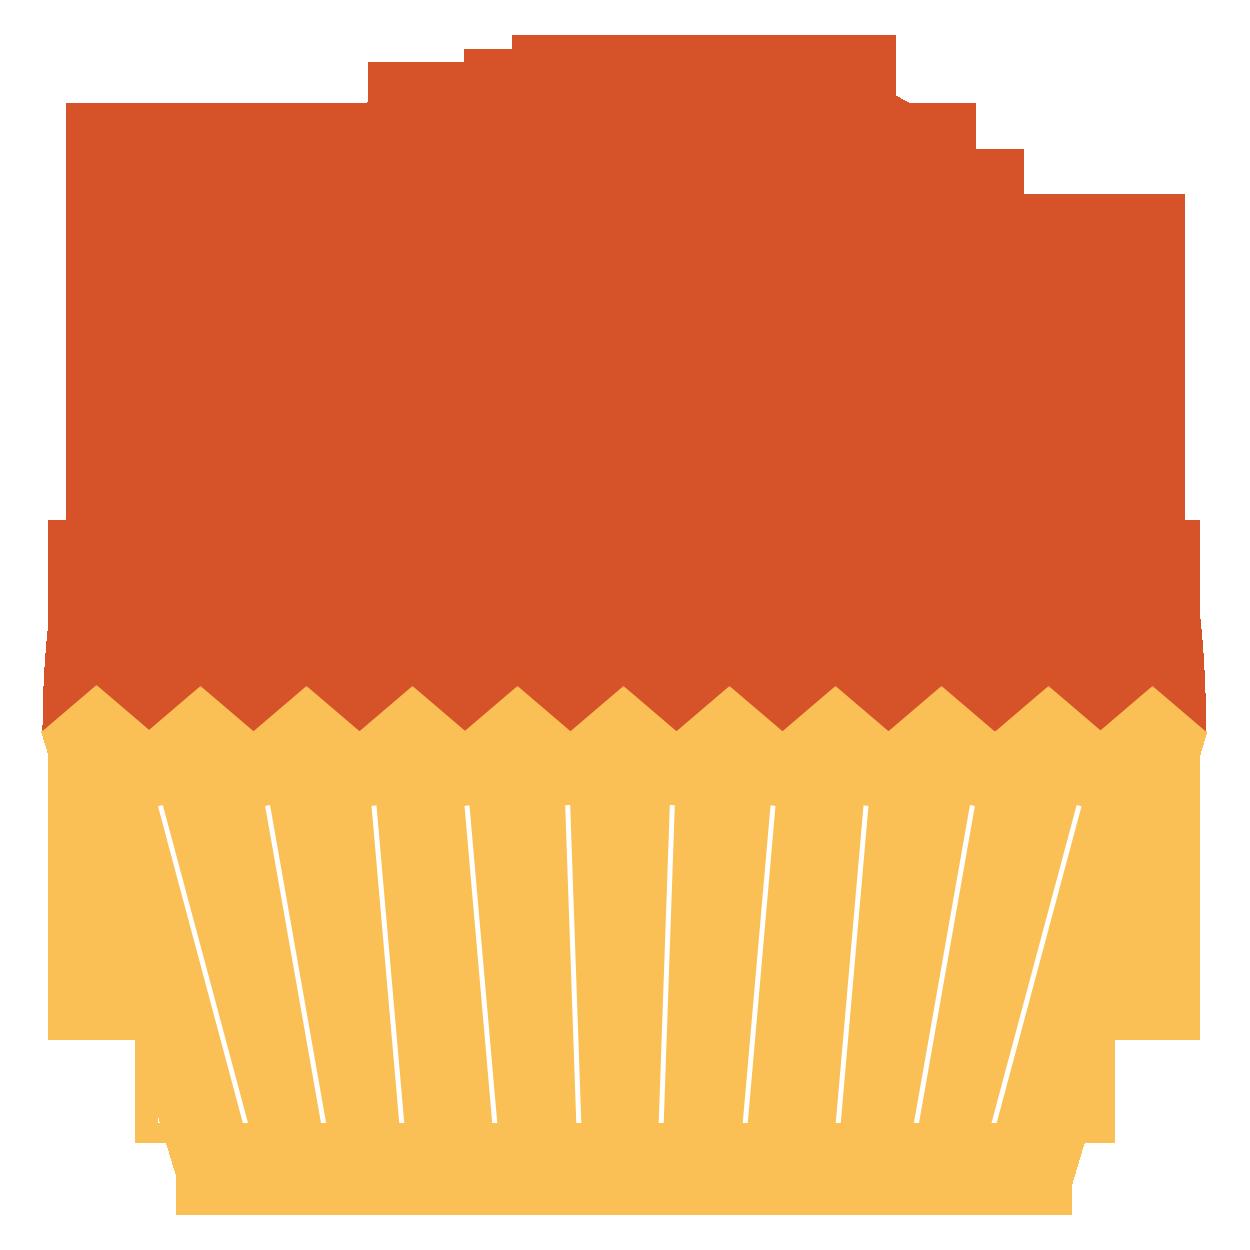 Muffin clipart plain #63 Clipart #63 cupcake cupcake